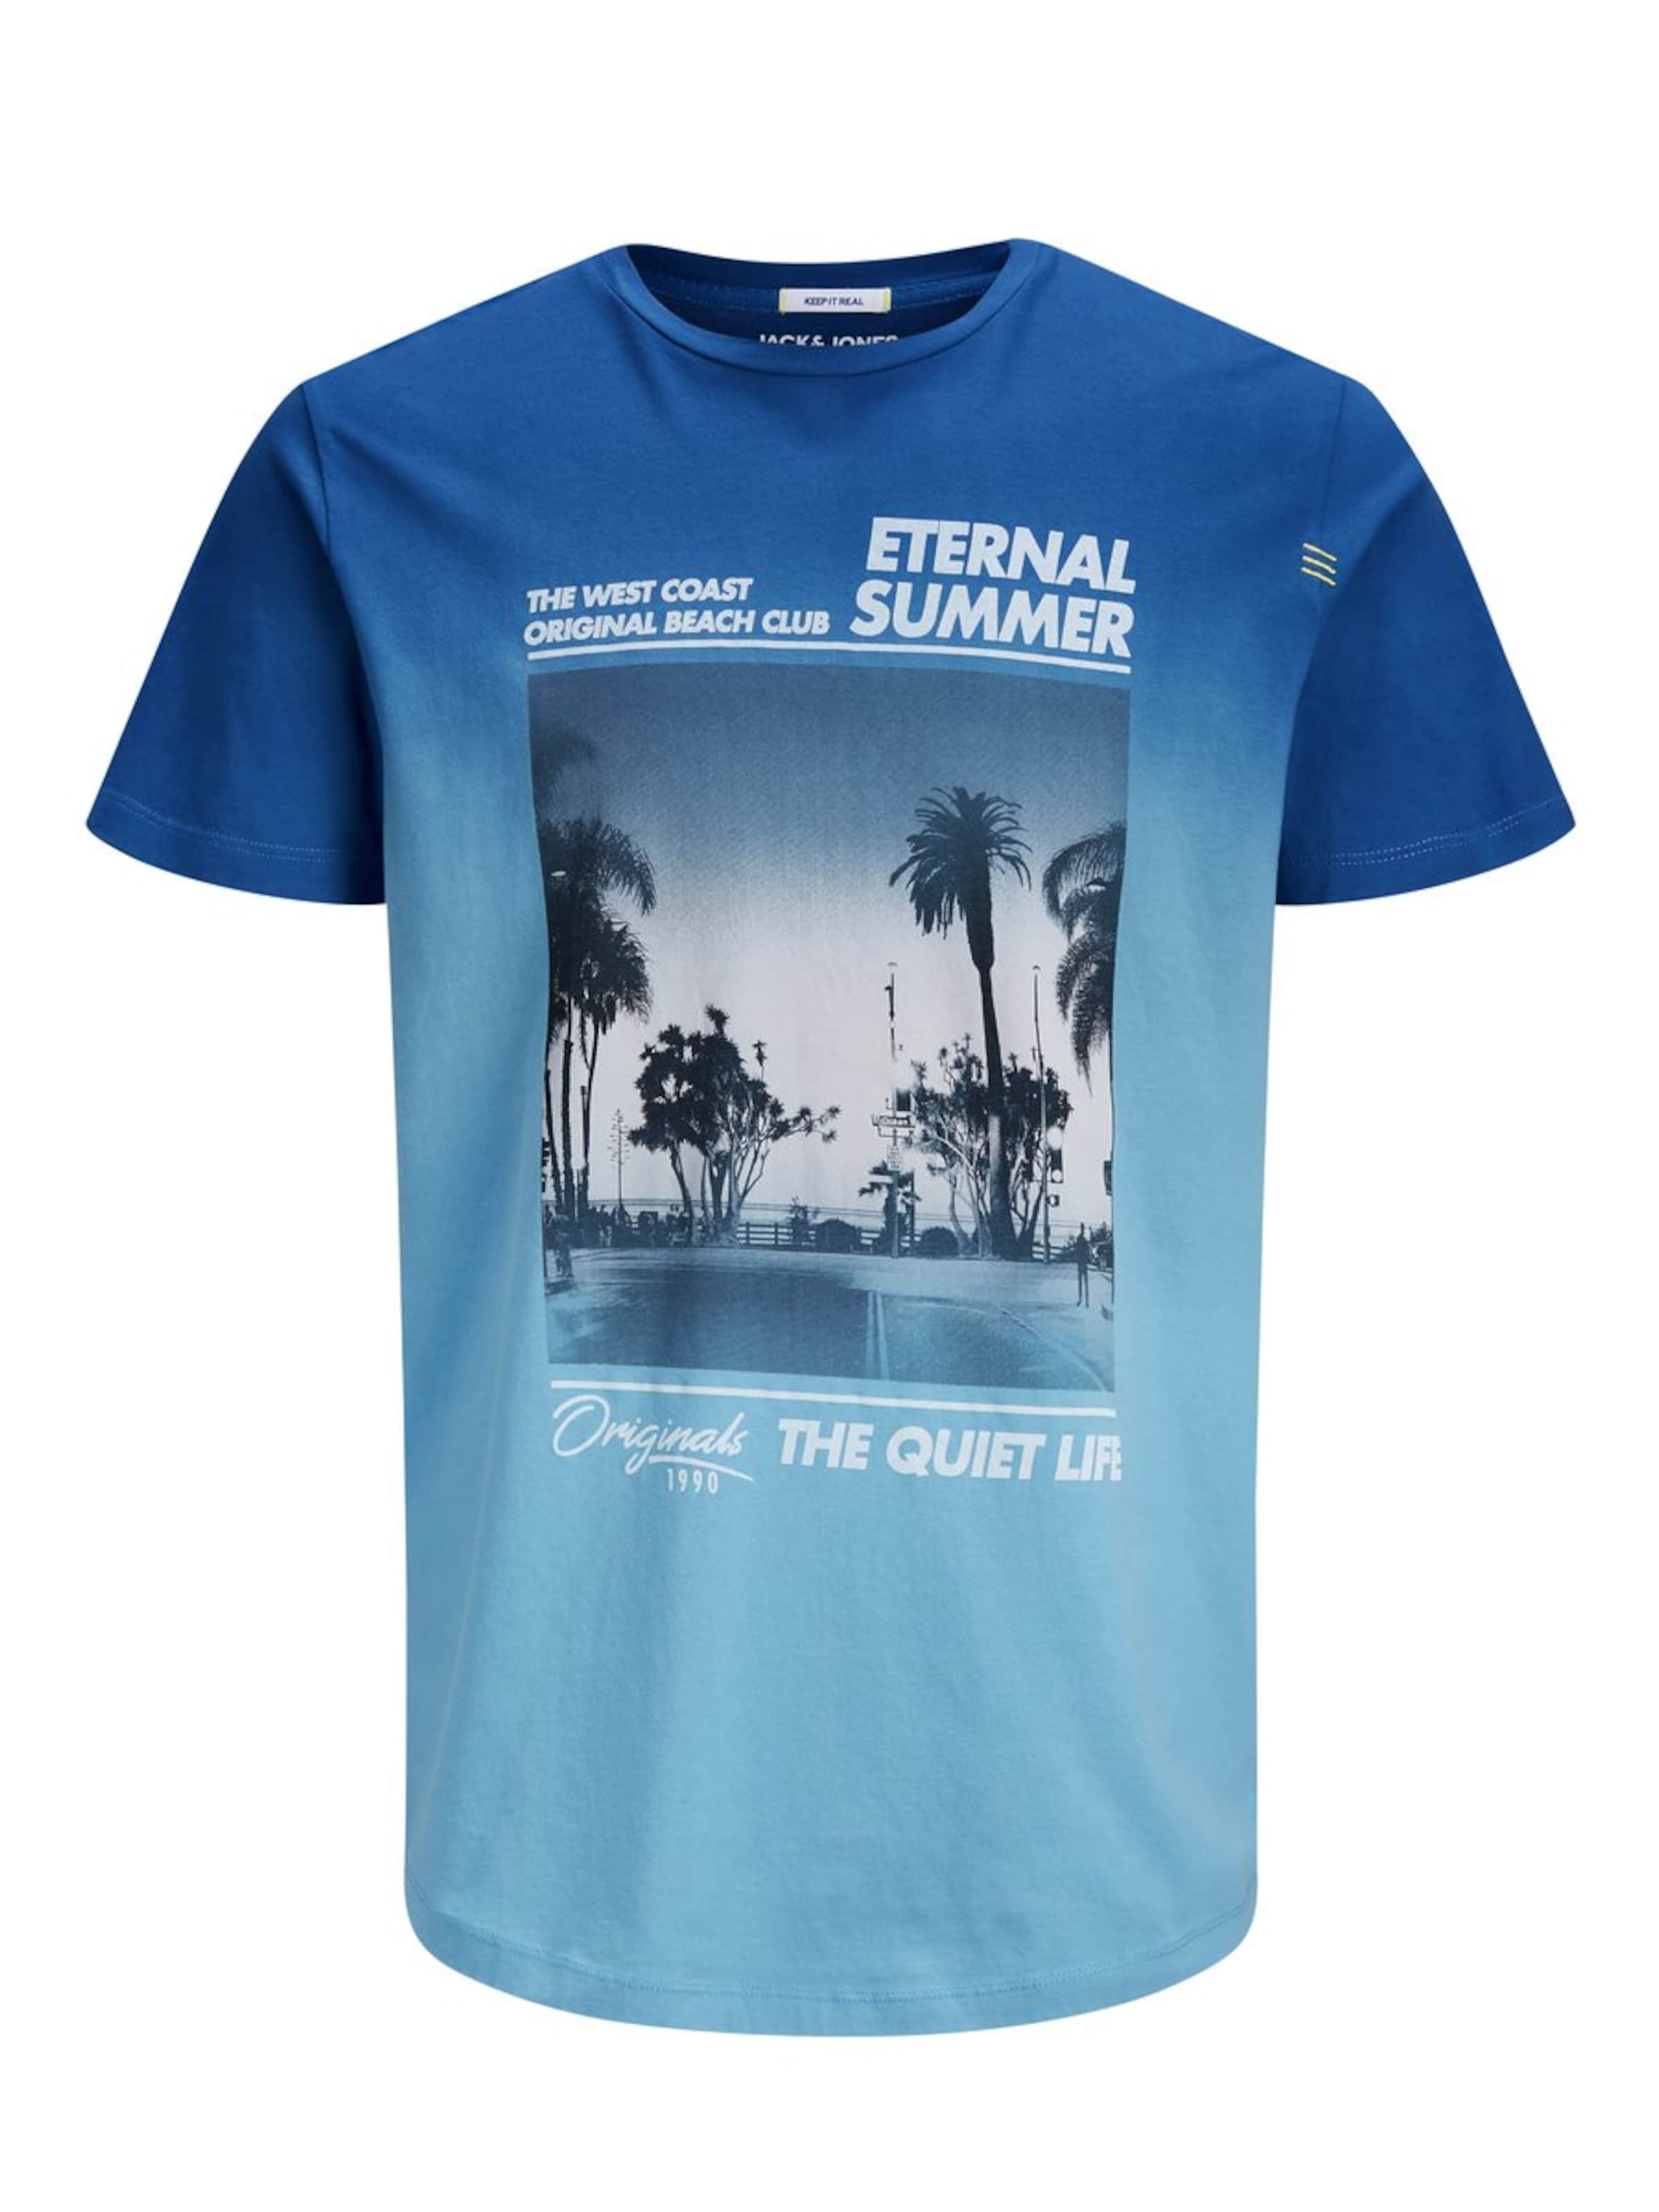 Jones Jackamp; Blau In T shirt P8yvOmn0Nw